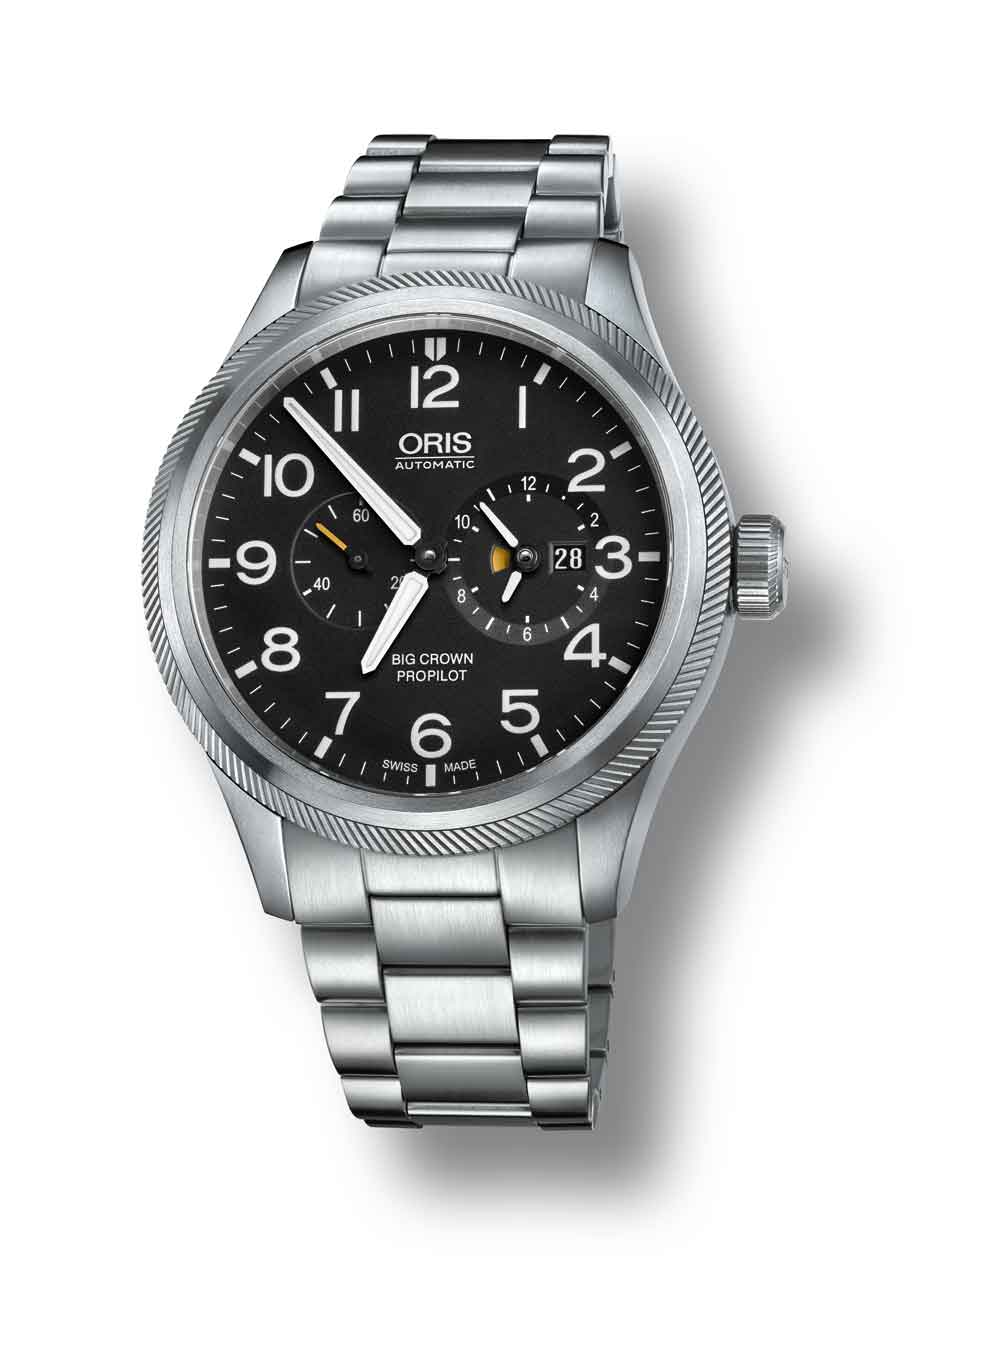 Reloj Oris Big Crown Propilot Worldtimer